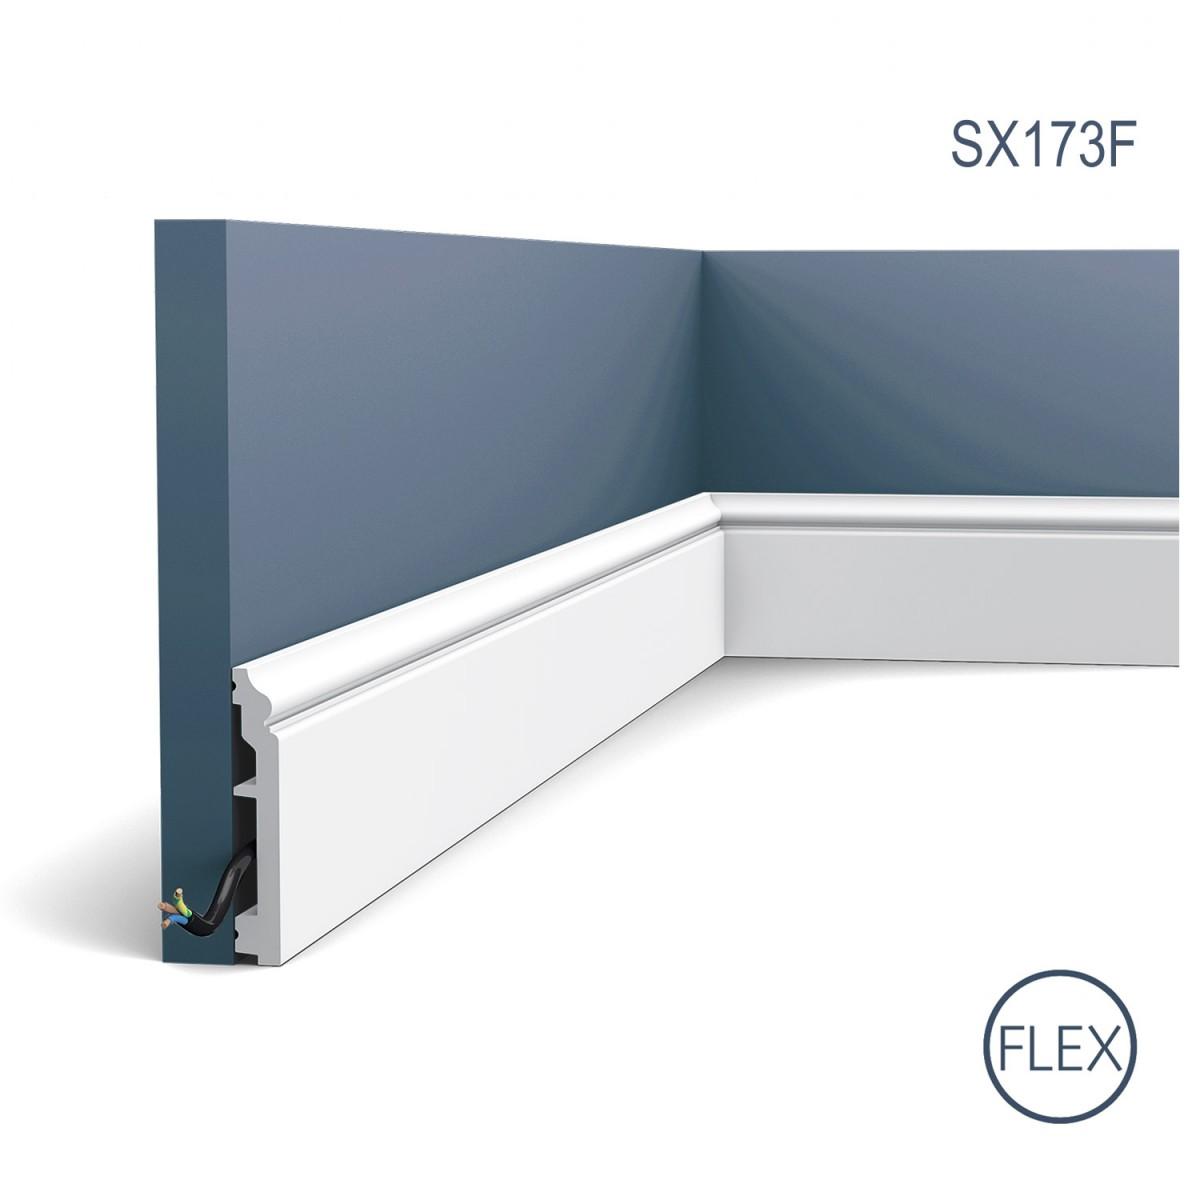 Plinta Flex Axxent SX173F, Dimensiuni: 200 X 1.6 X 10 cm, Orac Decor